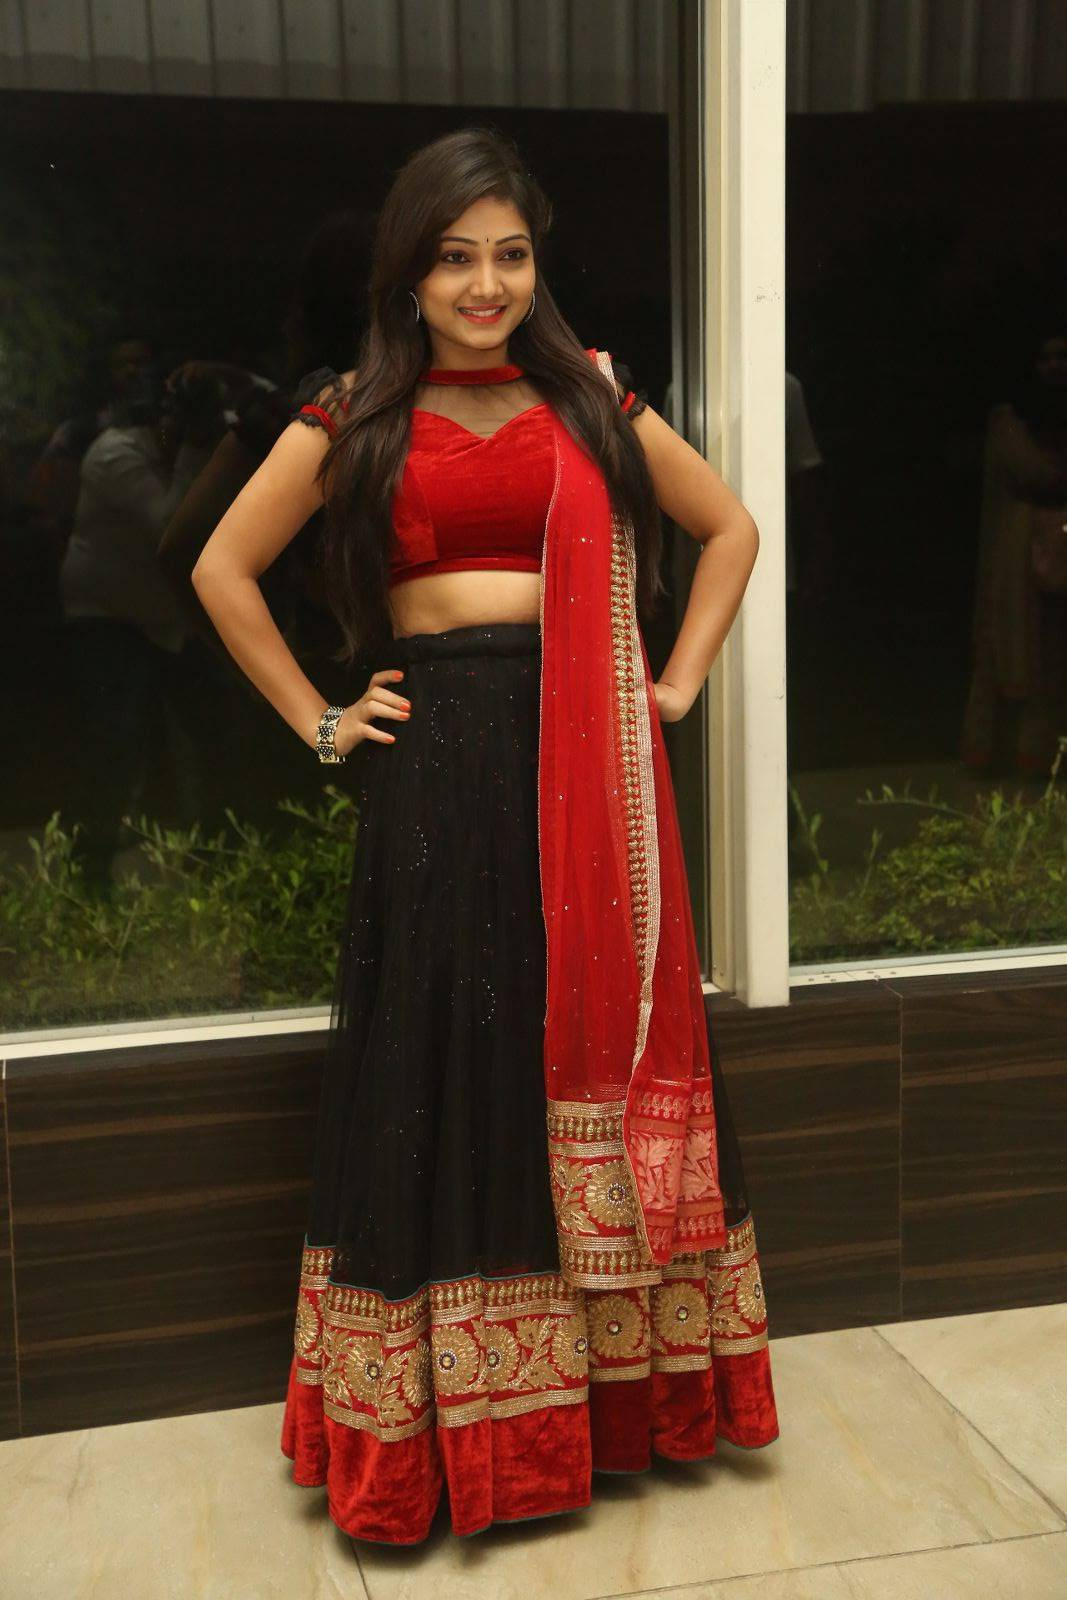 Telugu Tv Actress Priyanka Navel Show At Movie Trailer Launch In Red Langa Voni